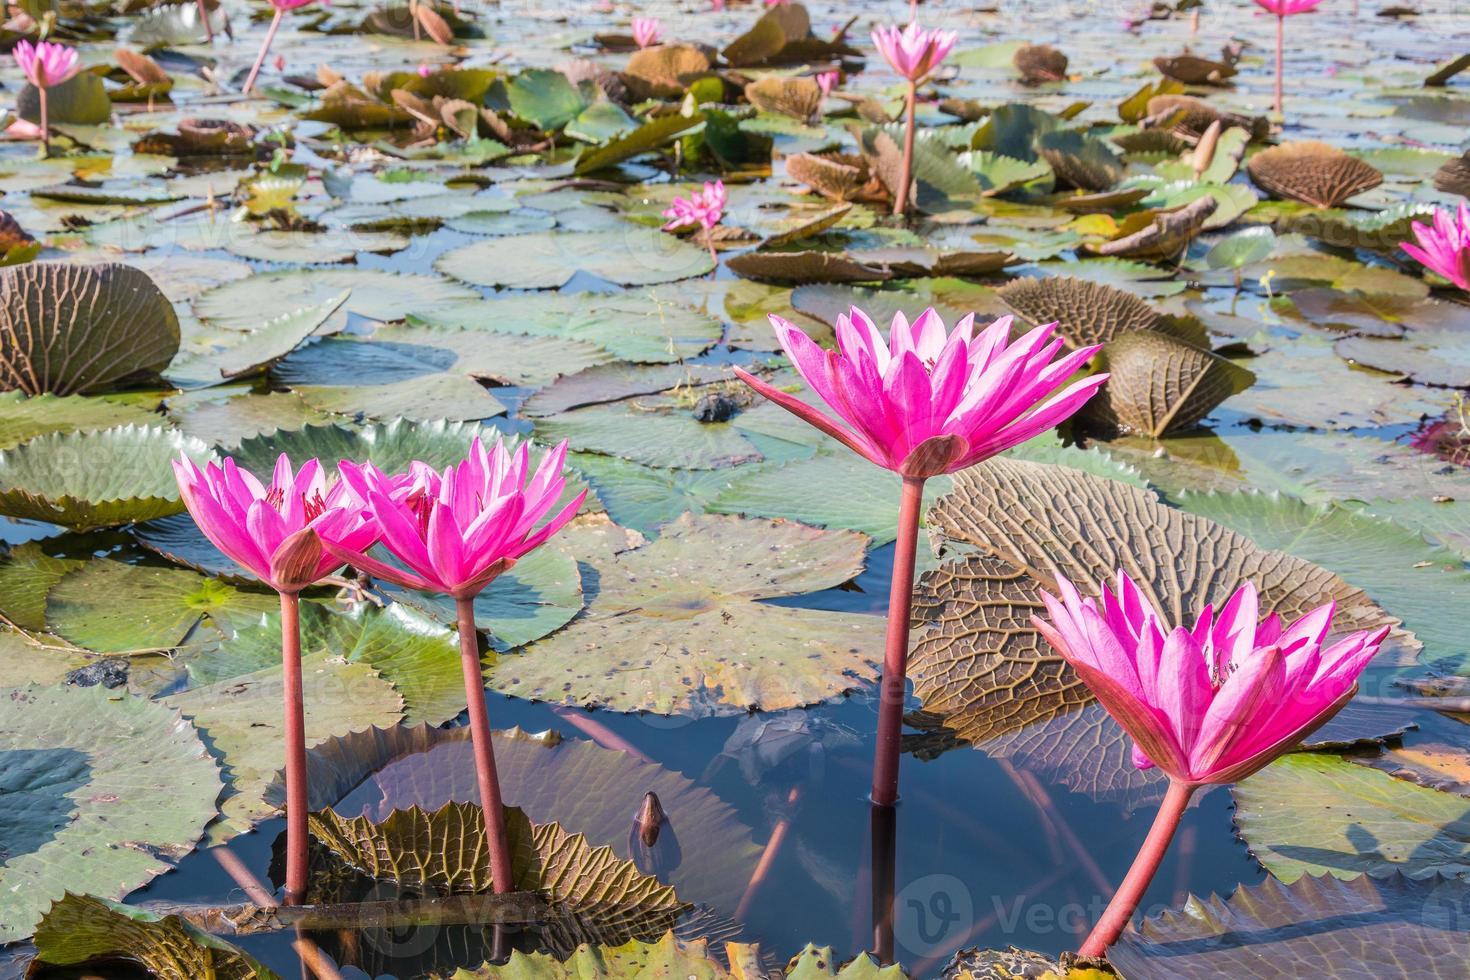 a bela flor de lótus florescendo no lago foto